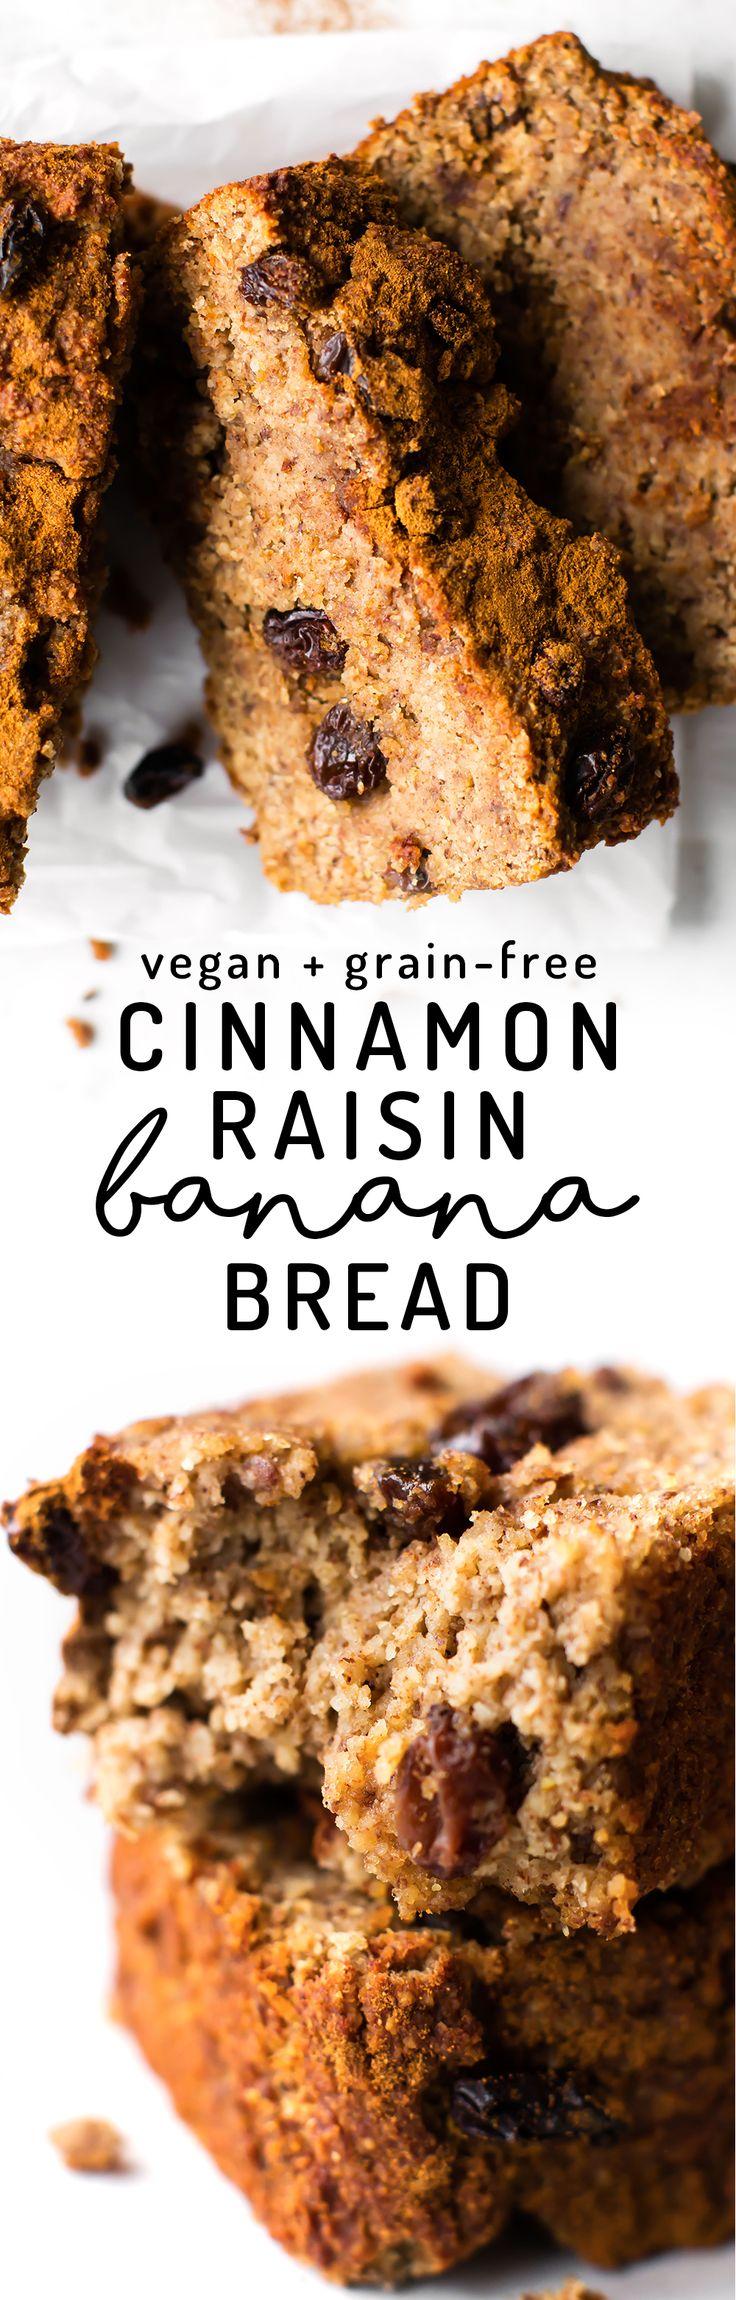 Best 25+ Vegan banana bread ideas on Pinterest | Vegan ...